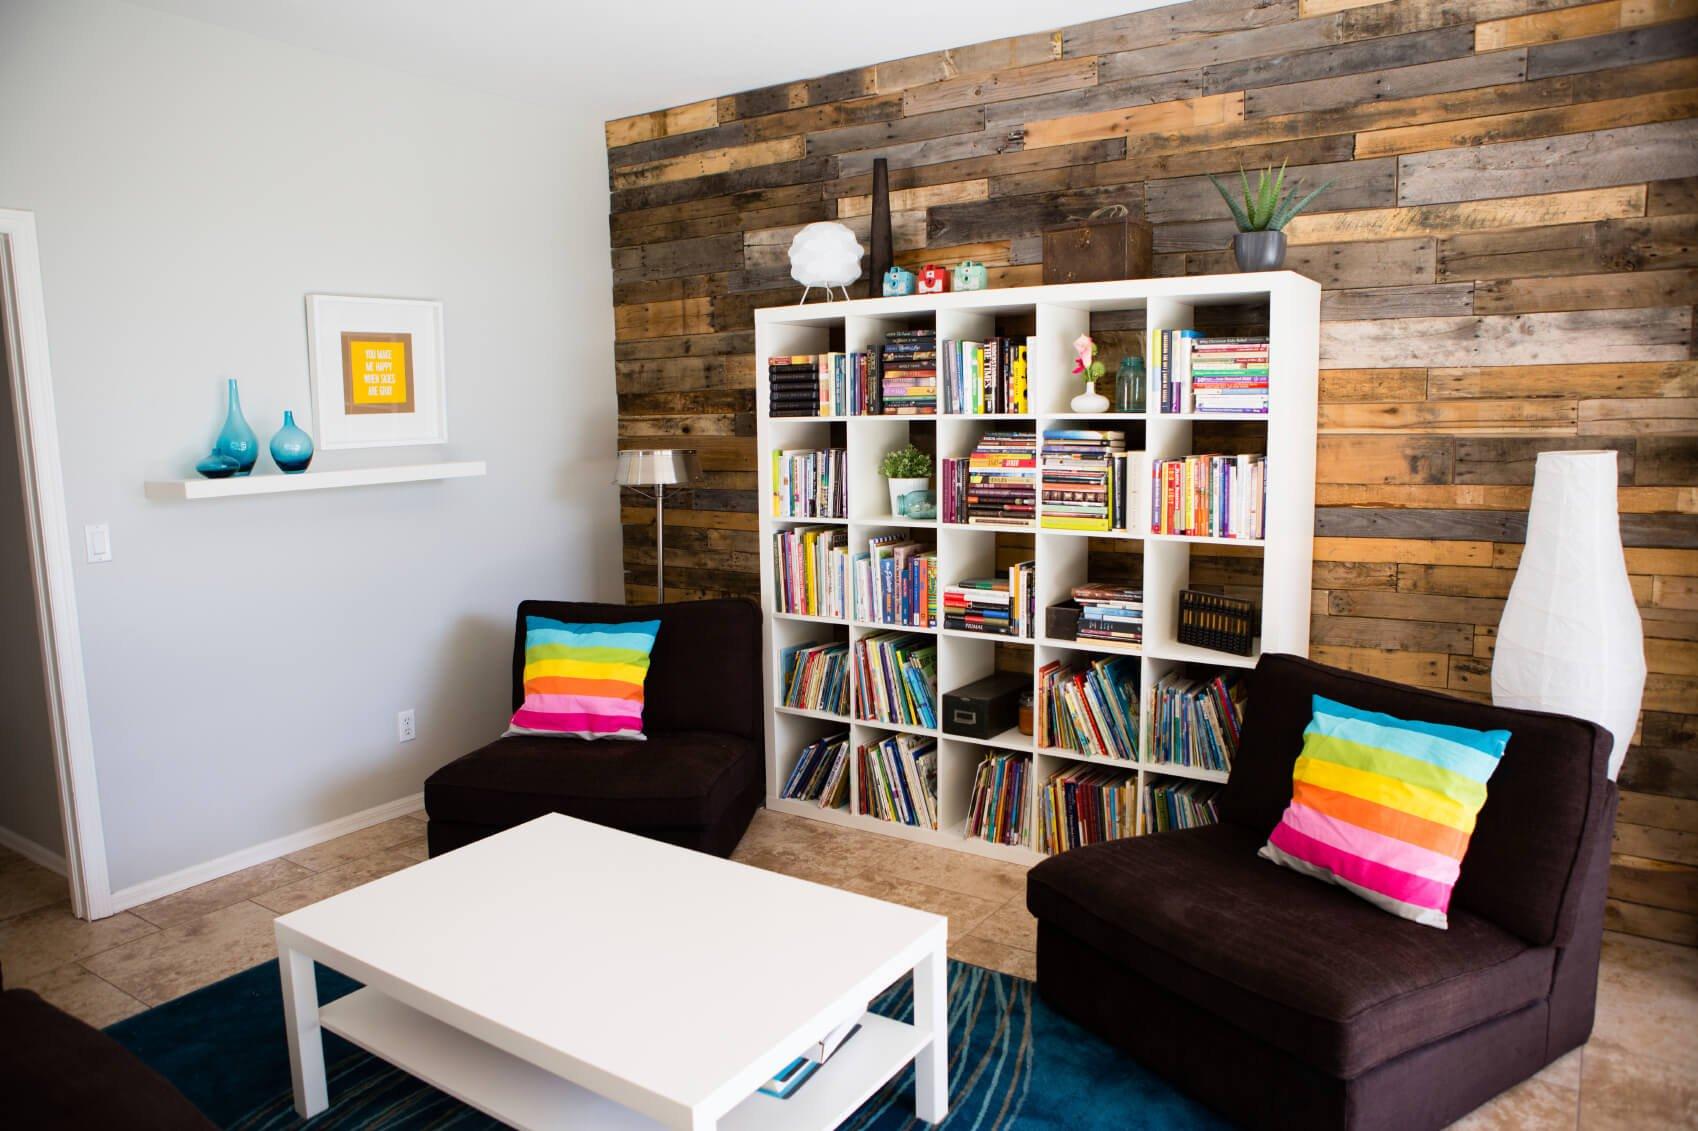 34 Attractive Living Room Storage Ideas, Living Room Storage Ideas